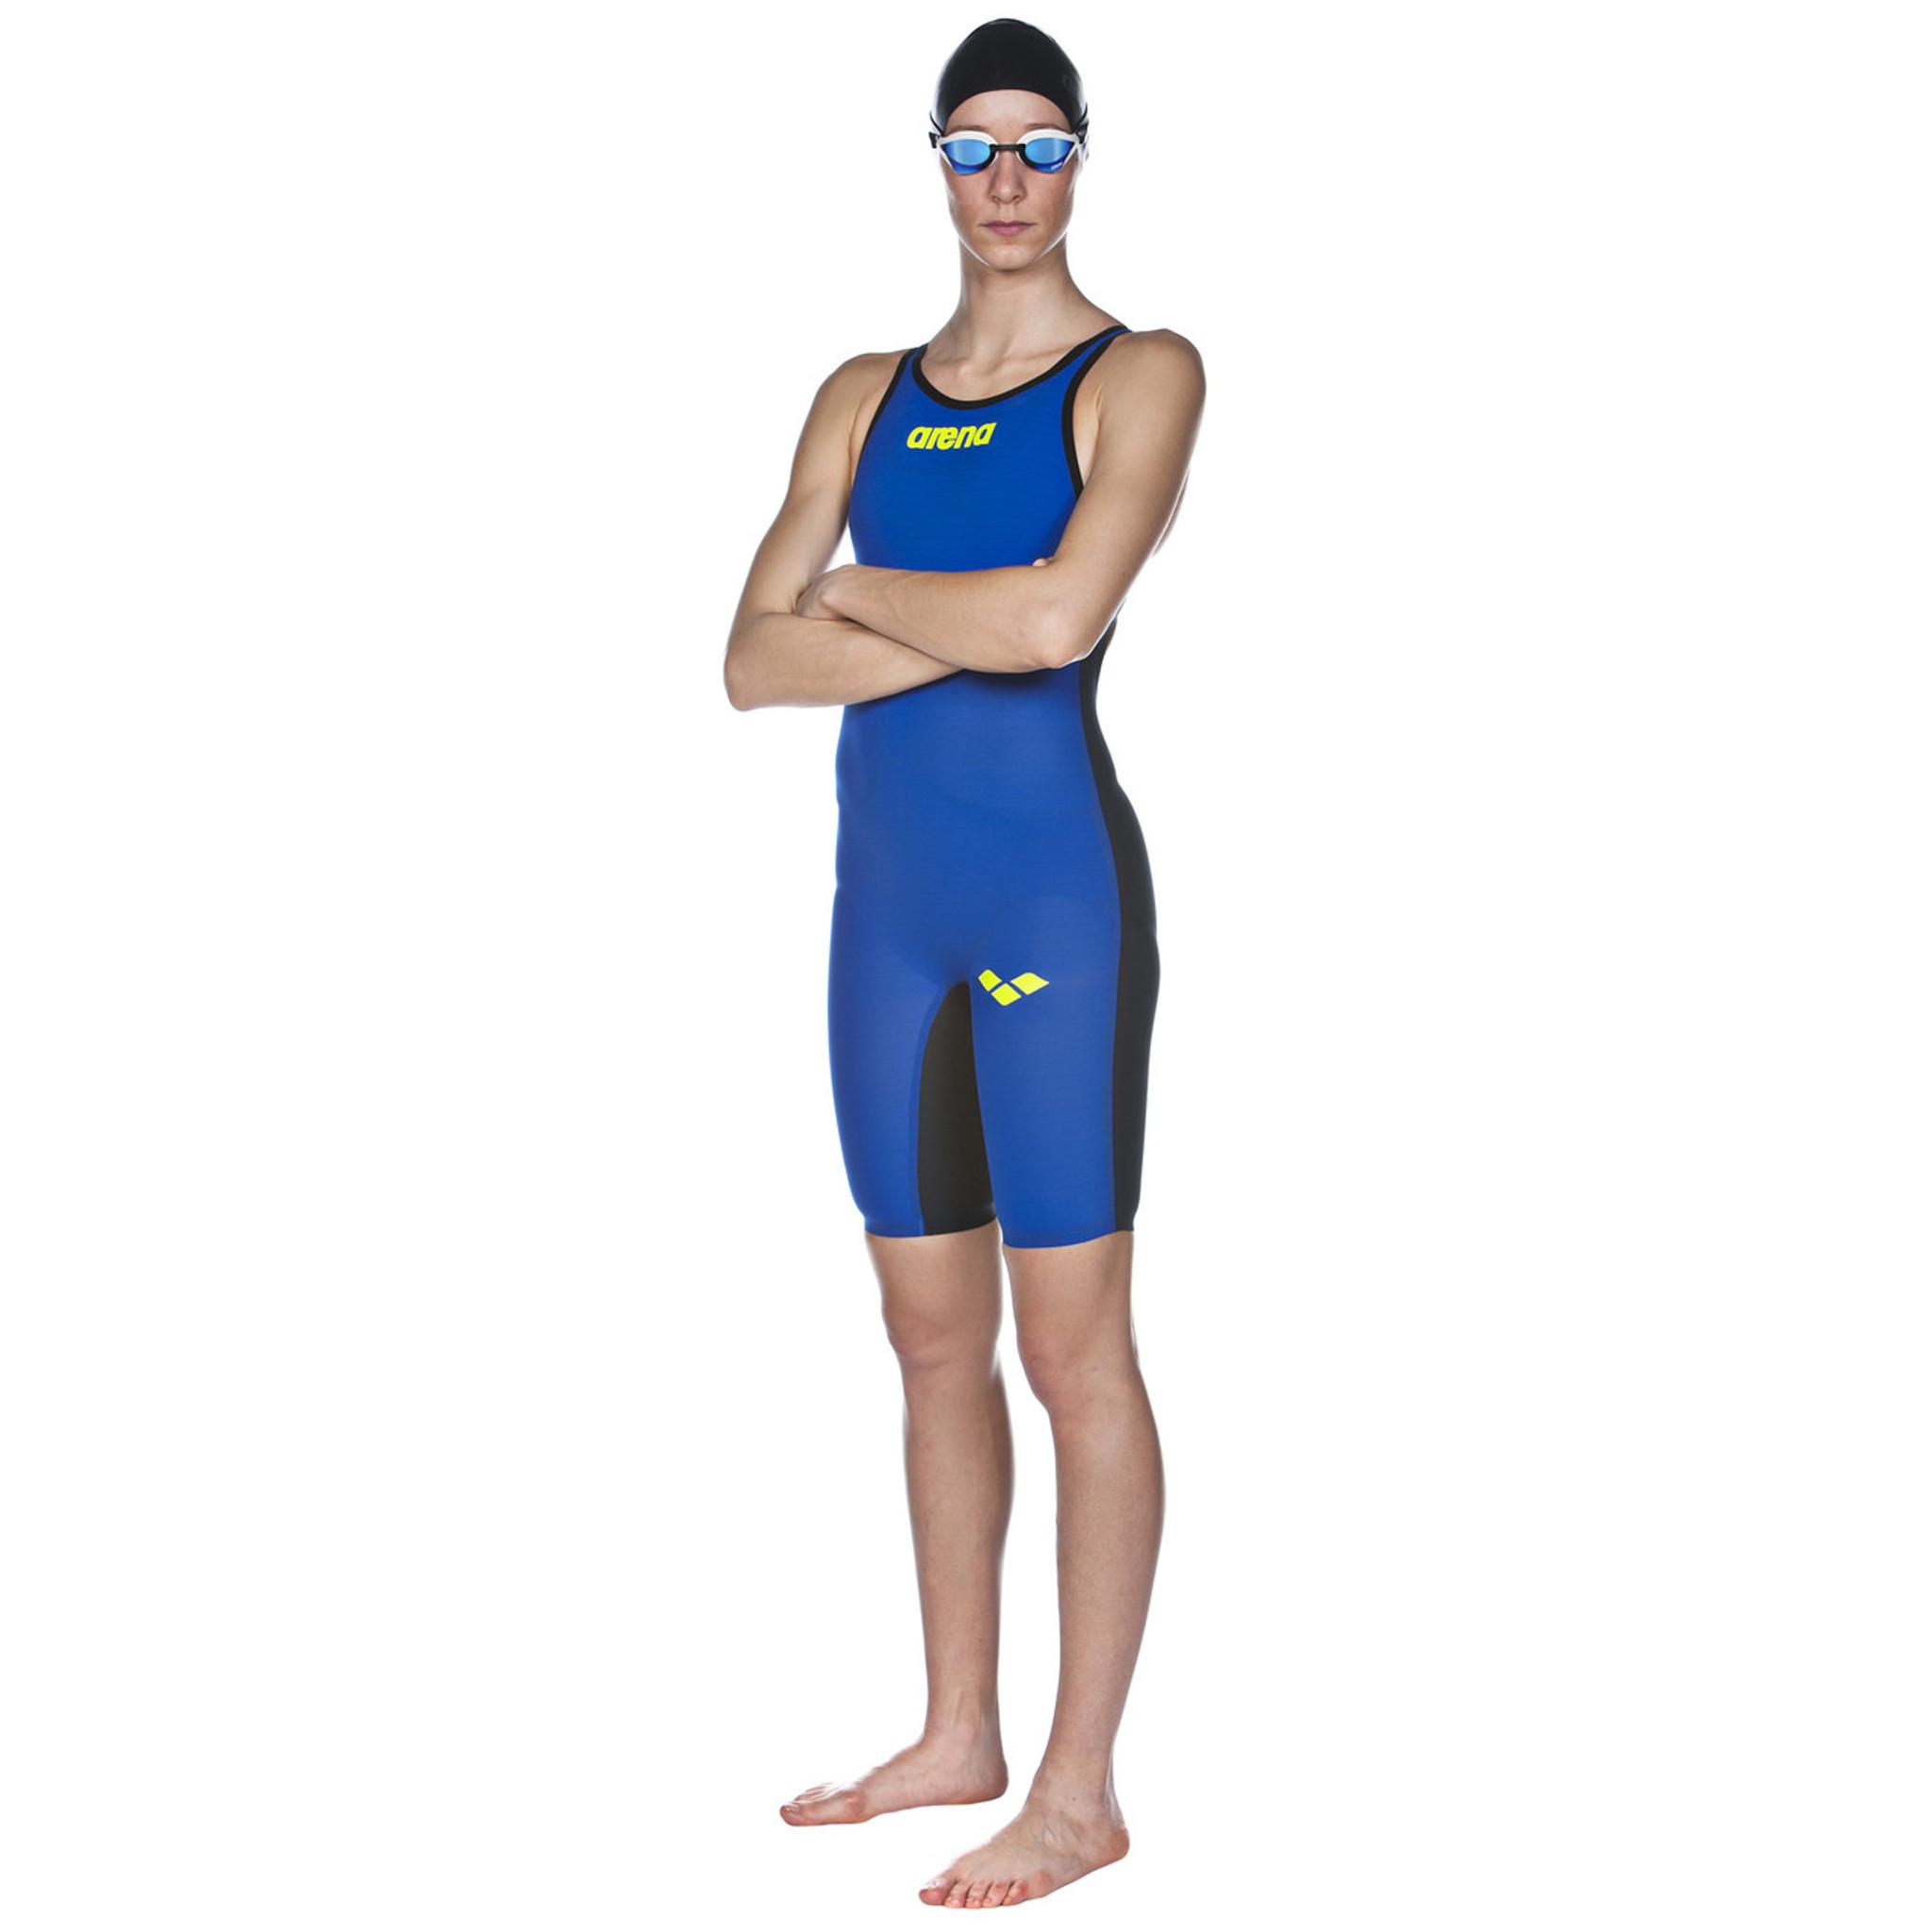 1aa4f6fd8ba Arena - Powerskin Carbon-Air Full Body Short Leg Open Back - Women's -  MyTriathlon